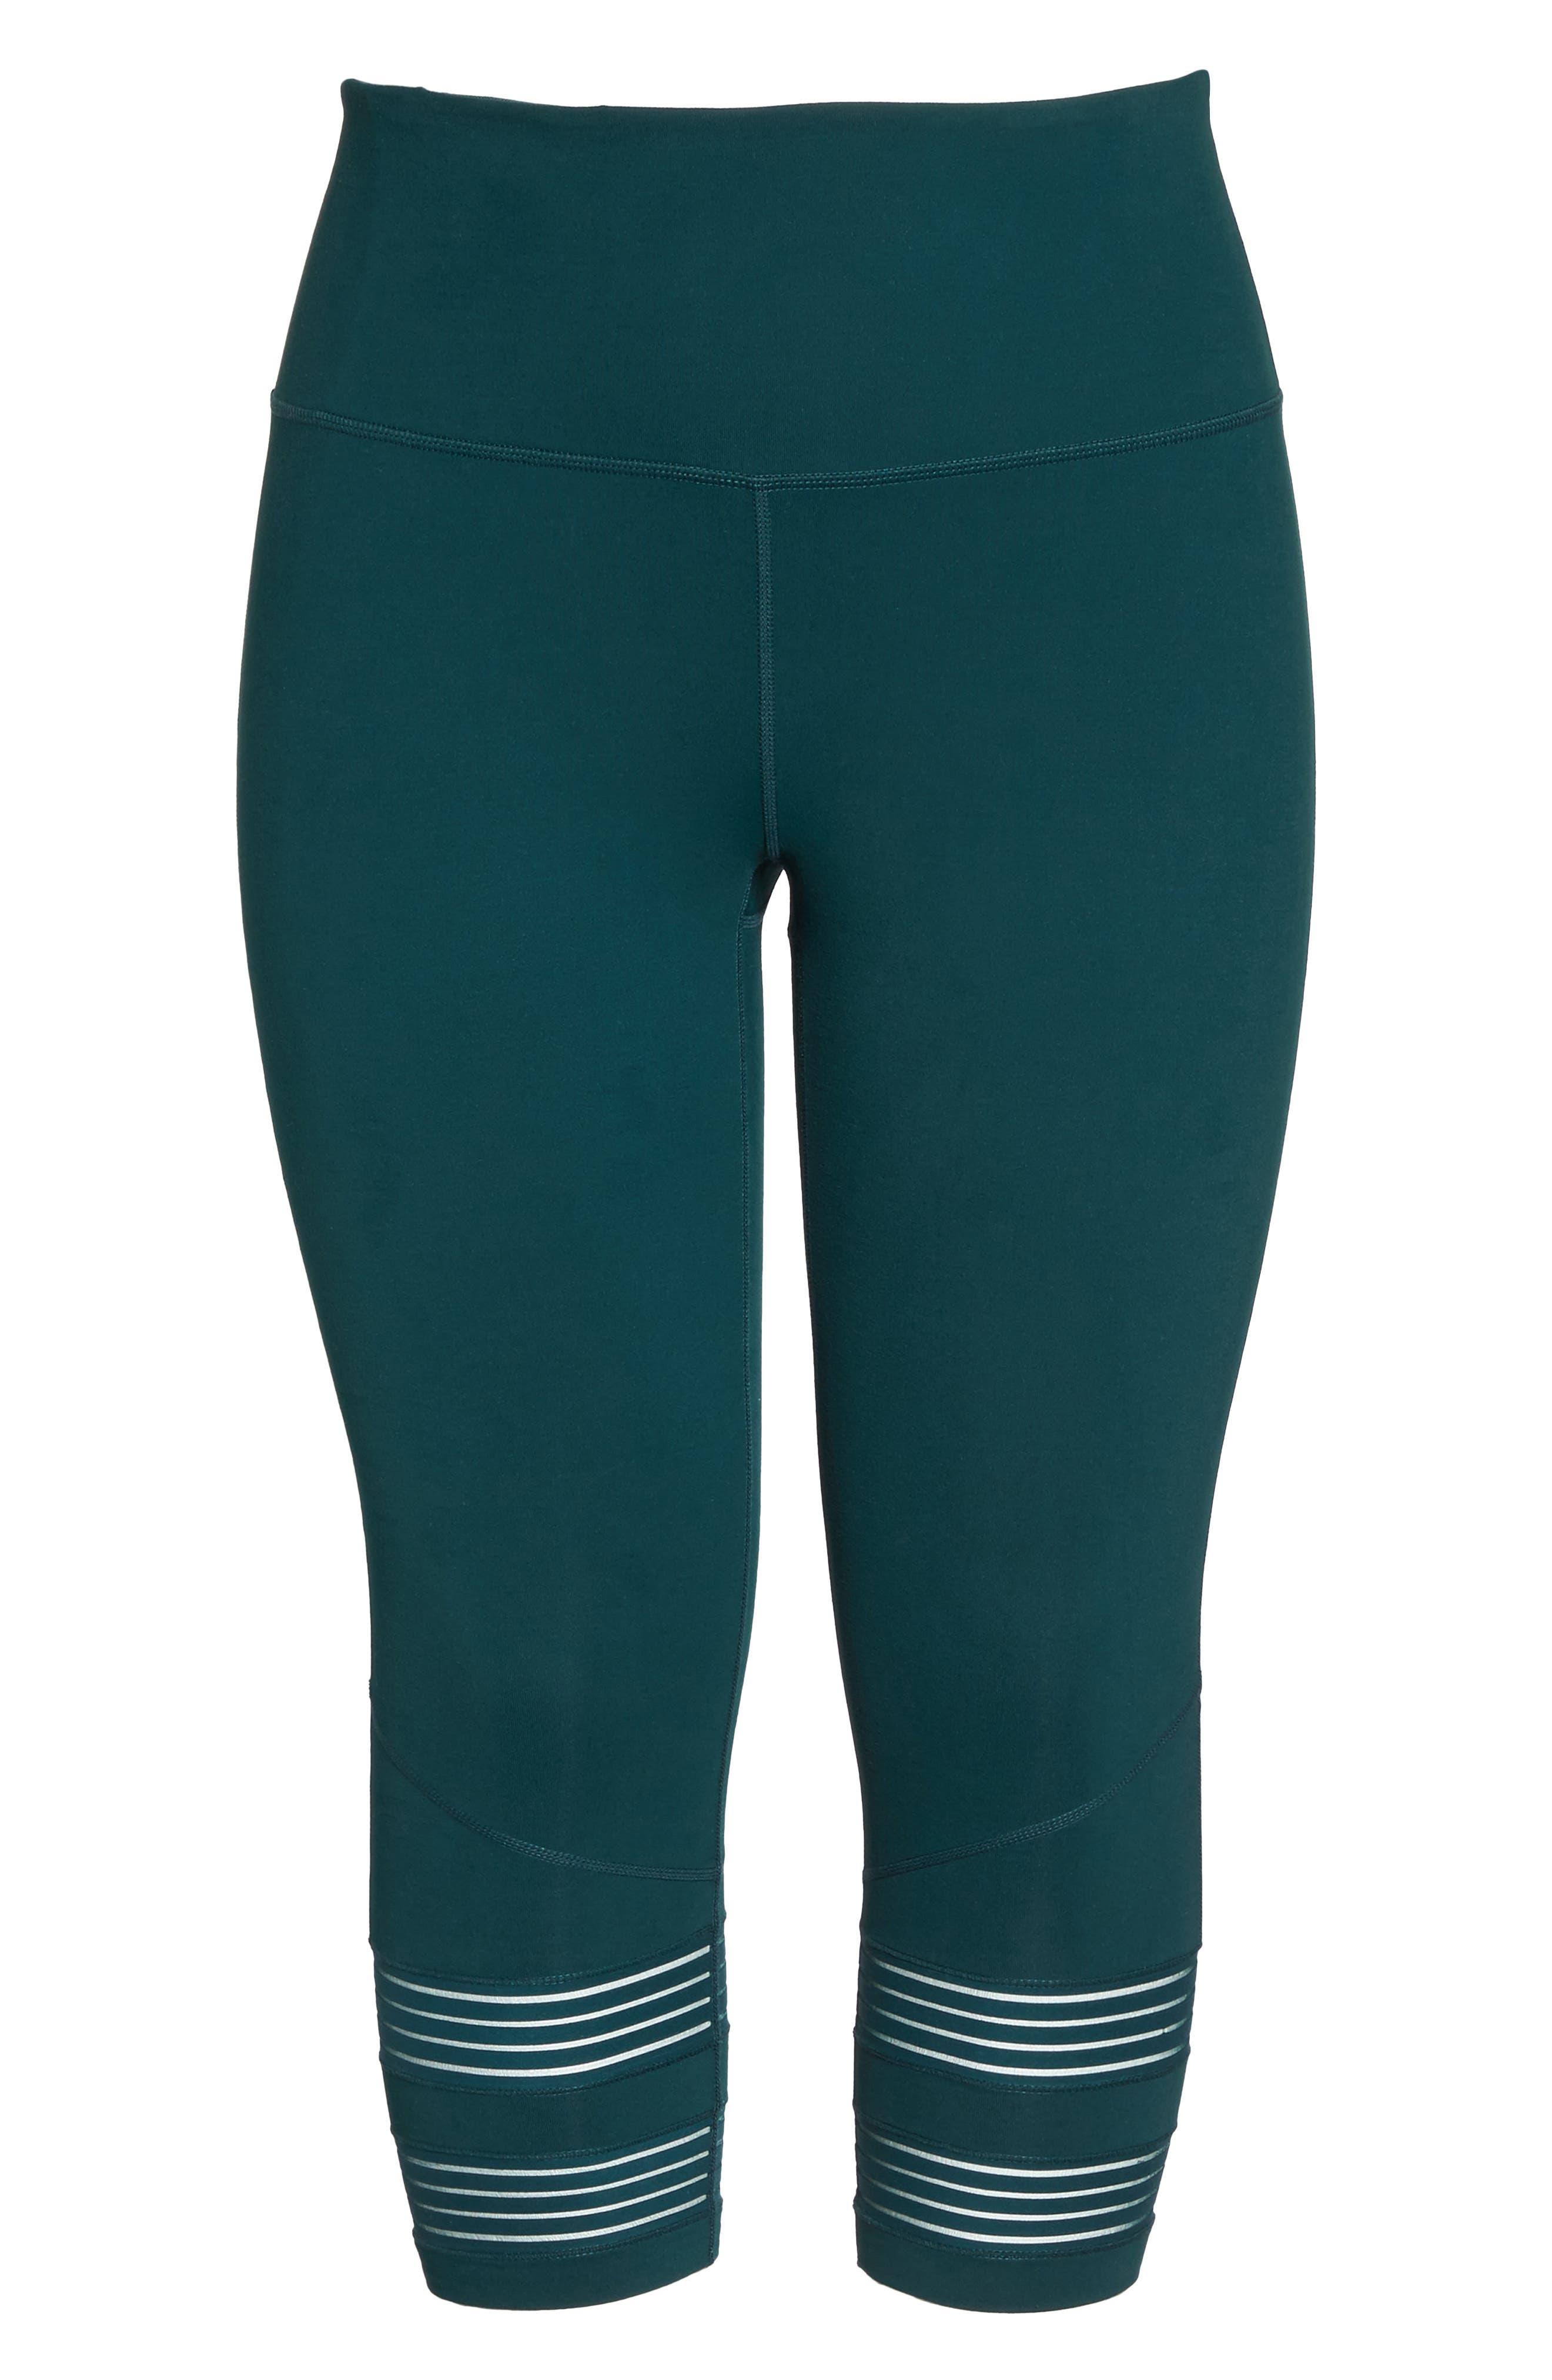 Twin High Waist Crop Leggings,                             Alternate thumbnail 8, color,                             Green Ponderosa